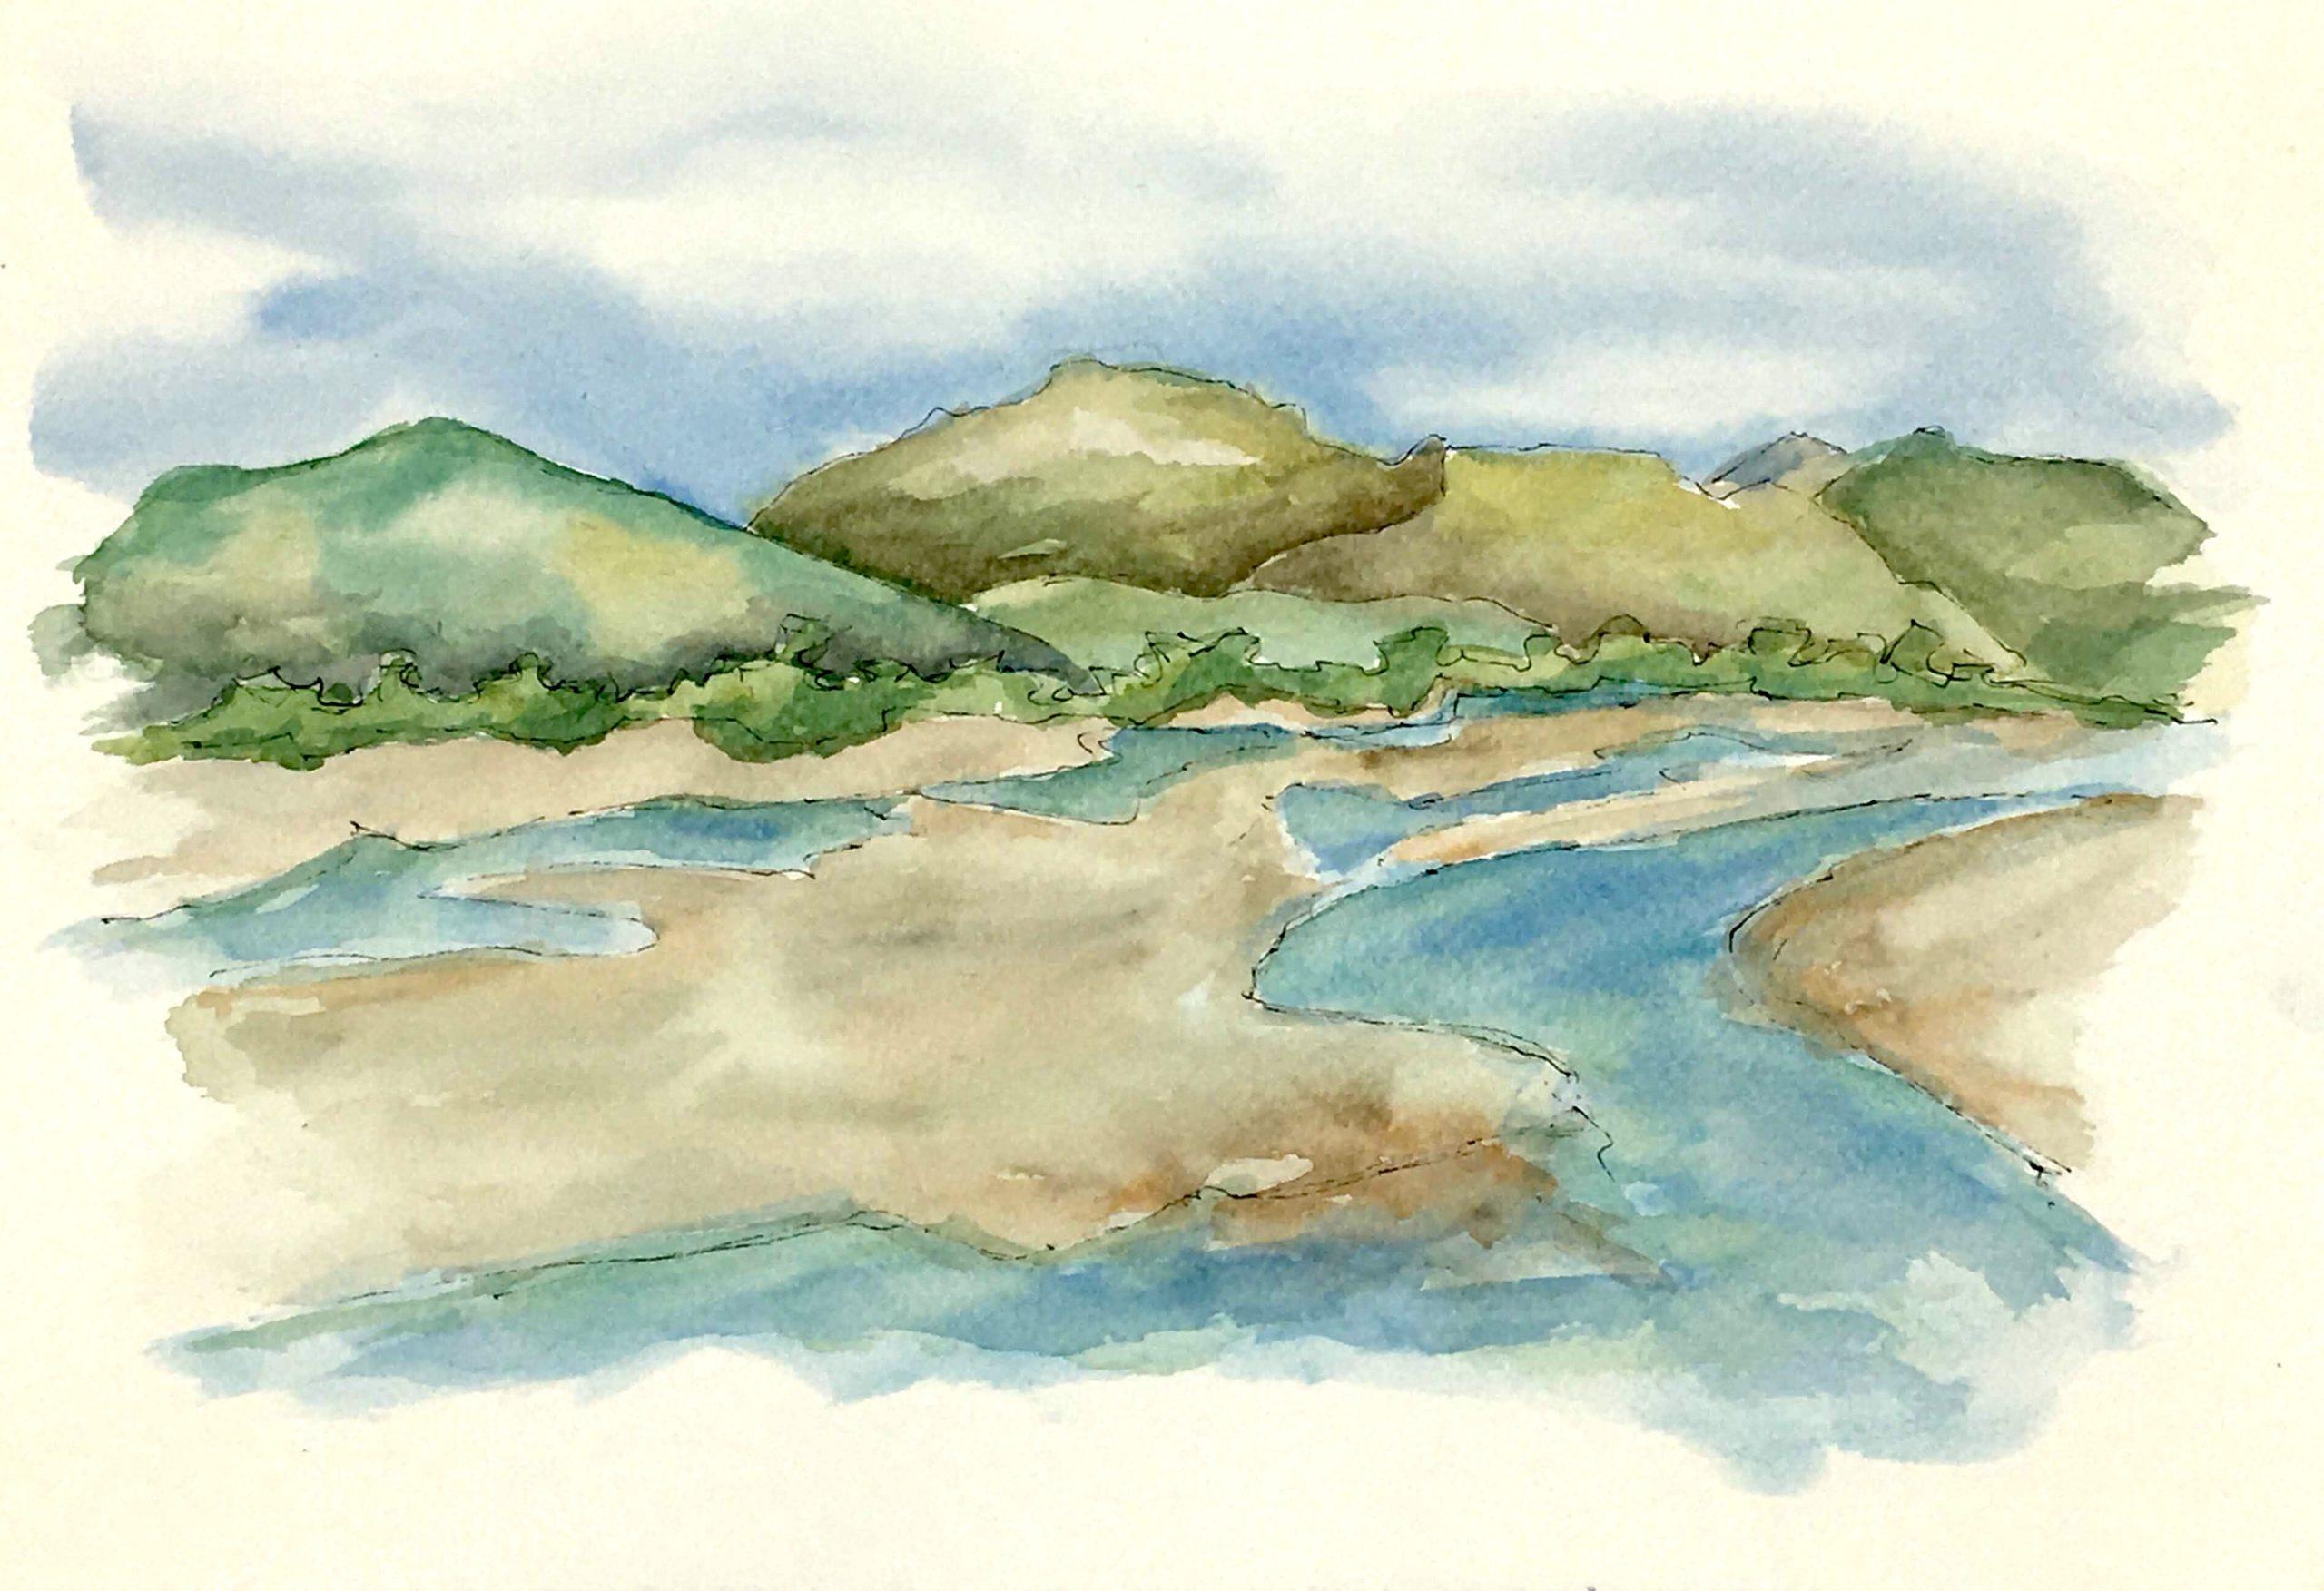 Painting of The Tagliamento River near Spilimbergo